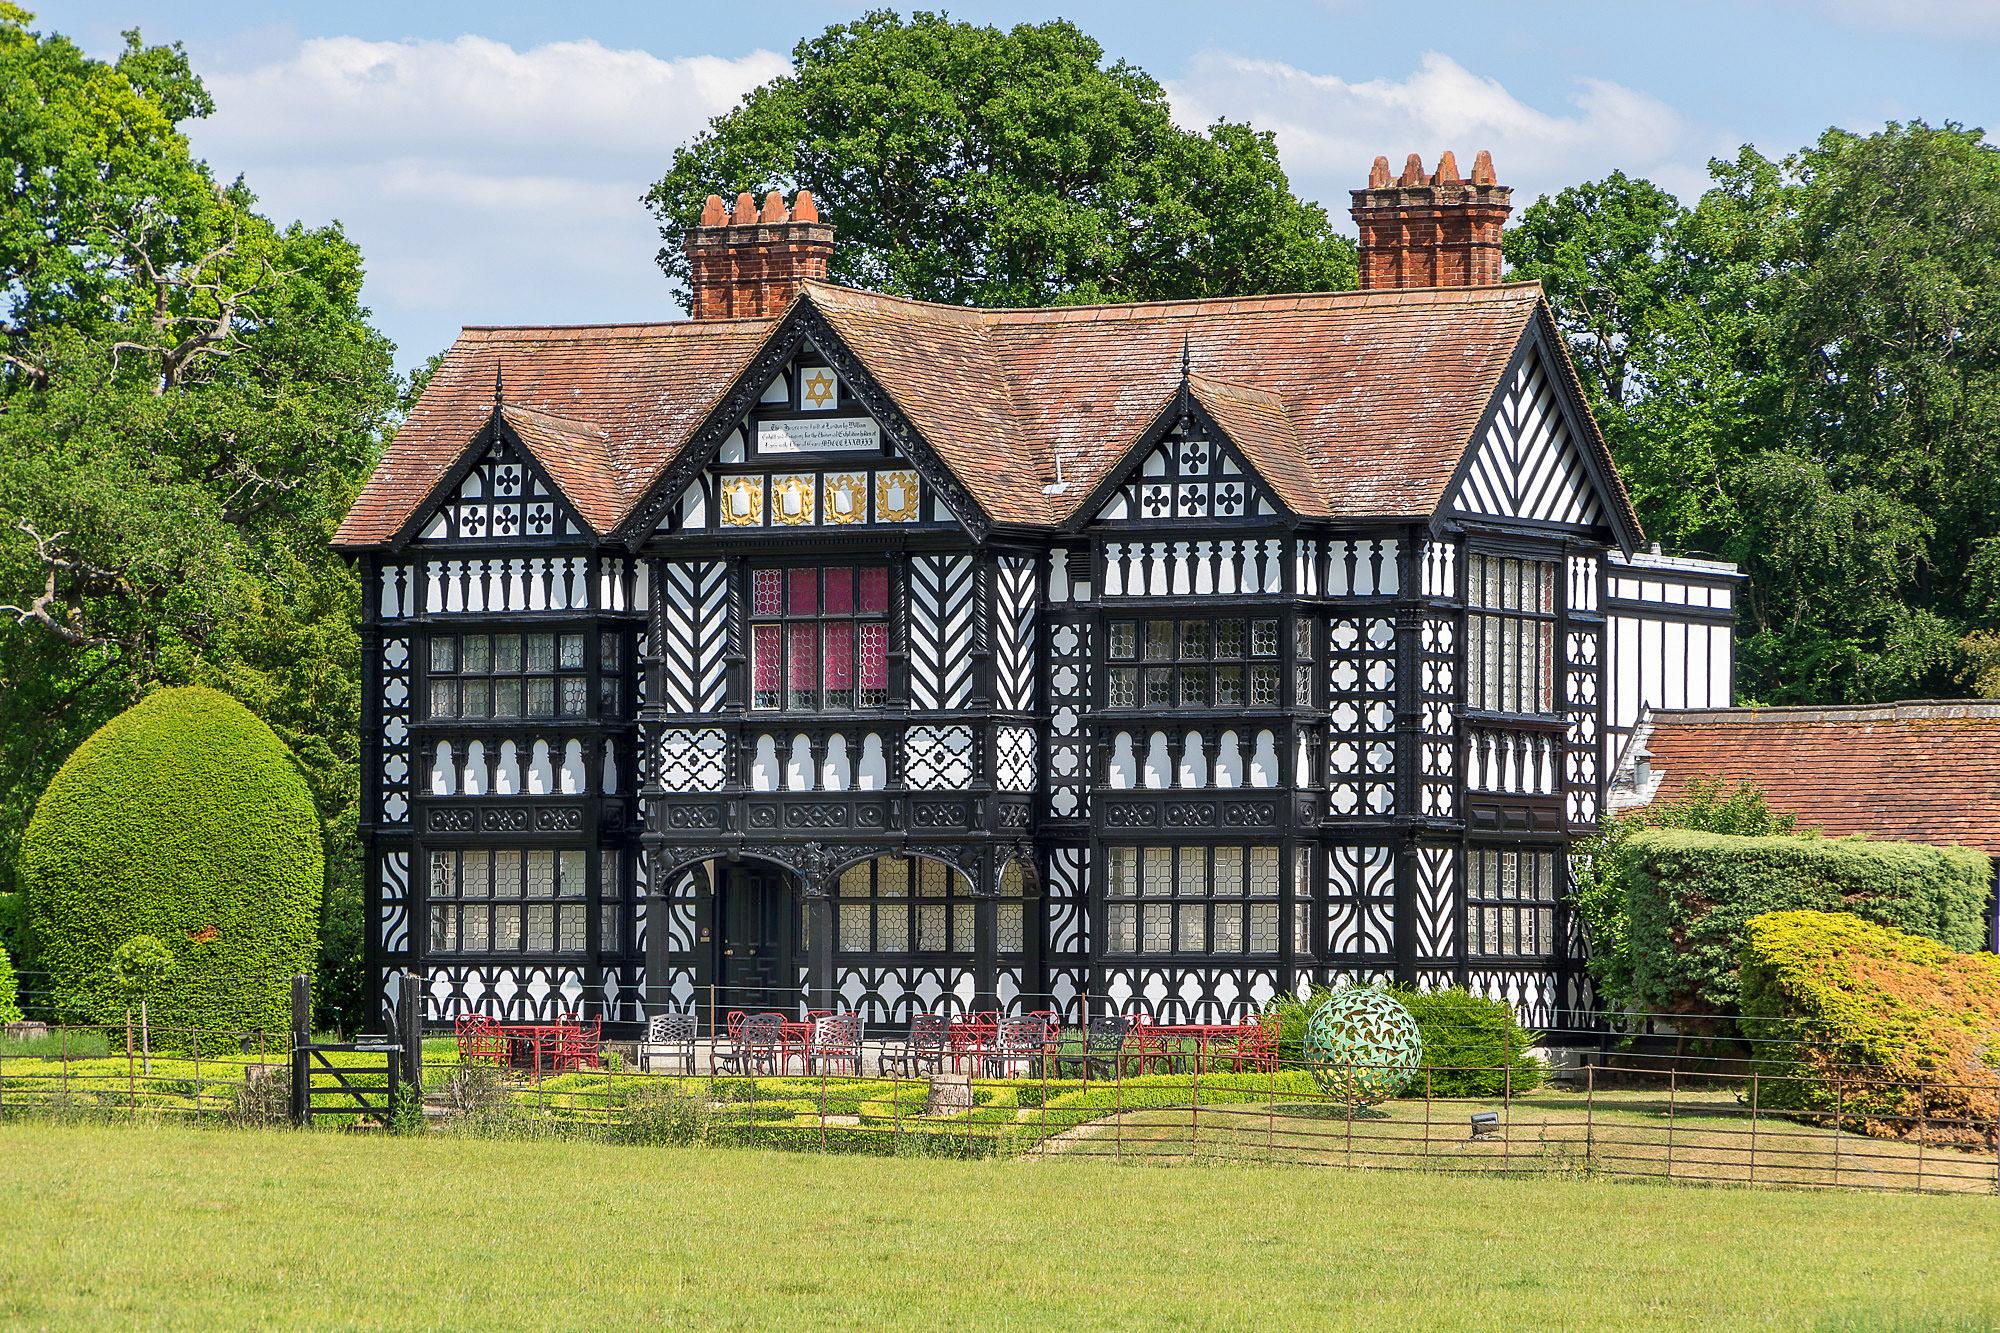 Paris House, Woburn, Bedfordshire by Ken Barley.jpg